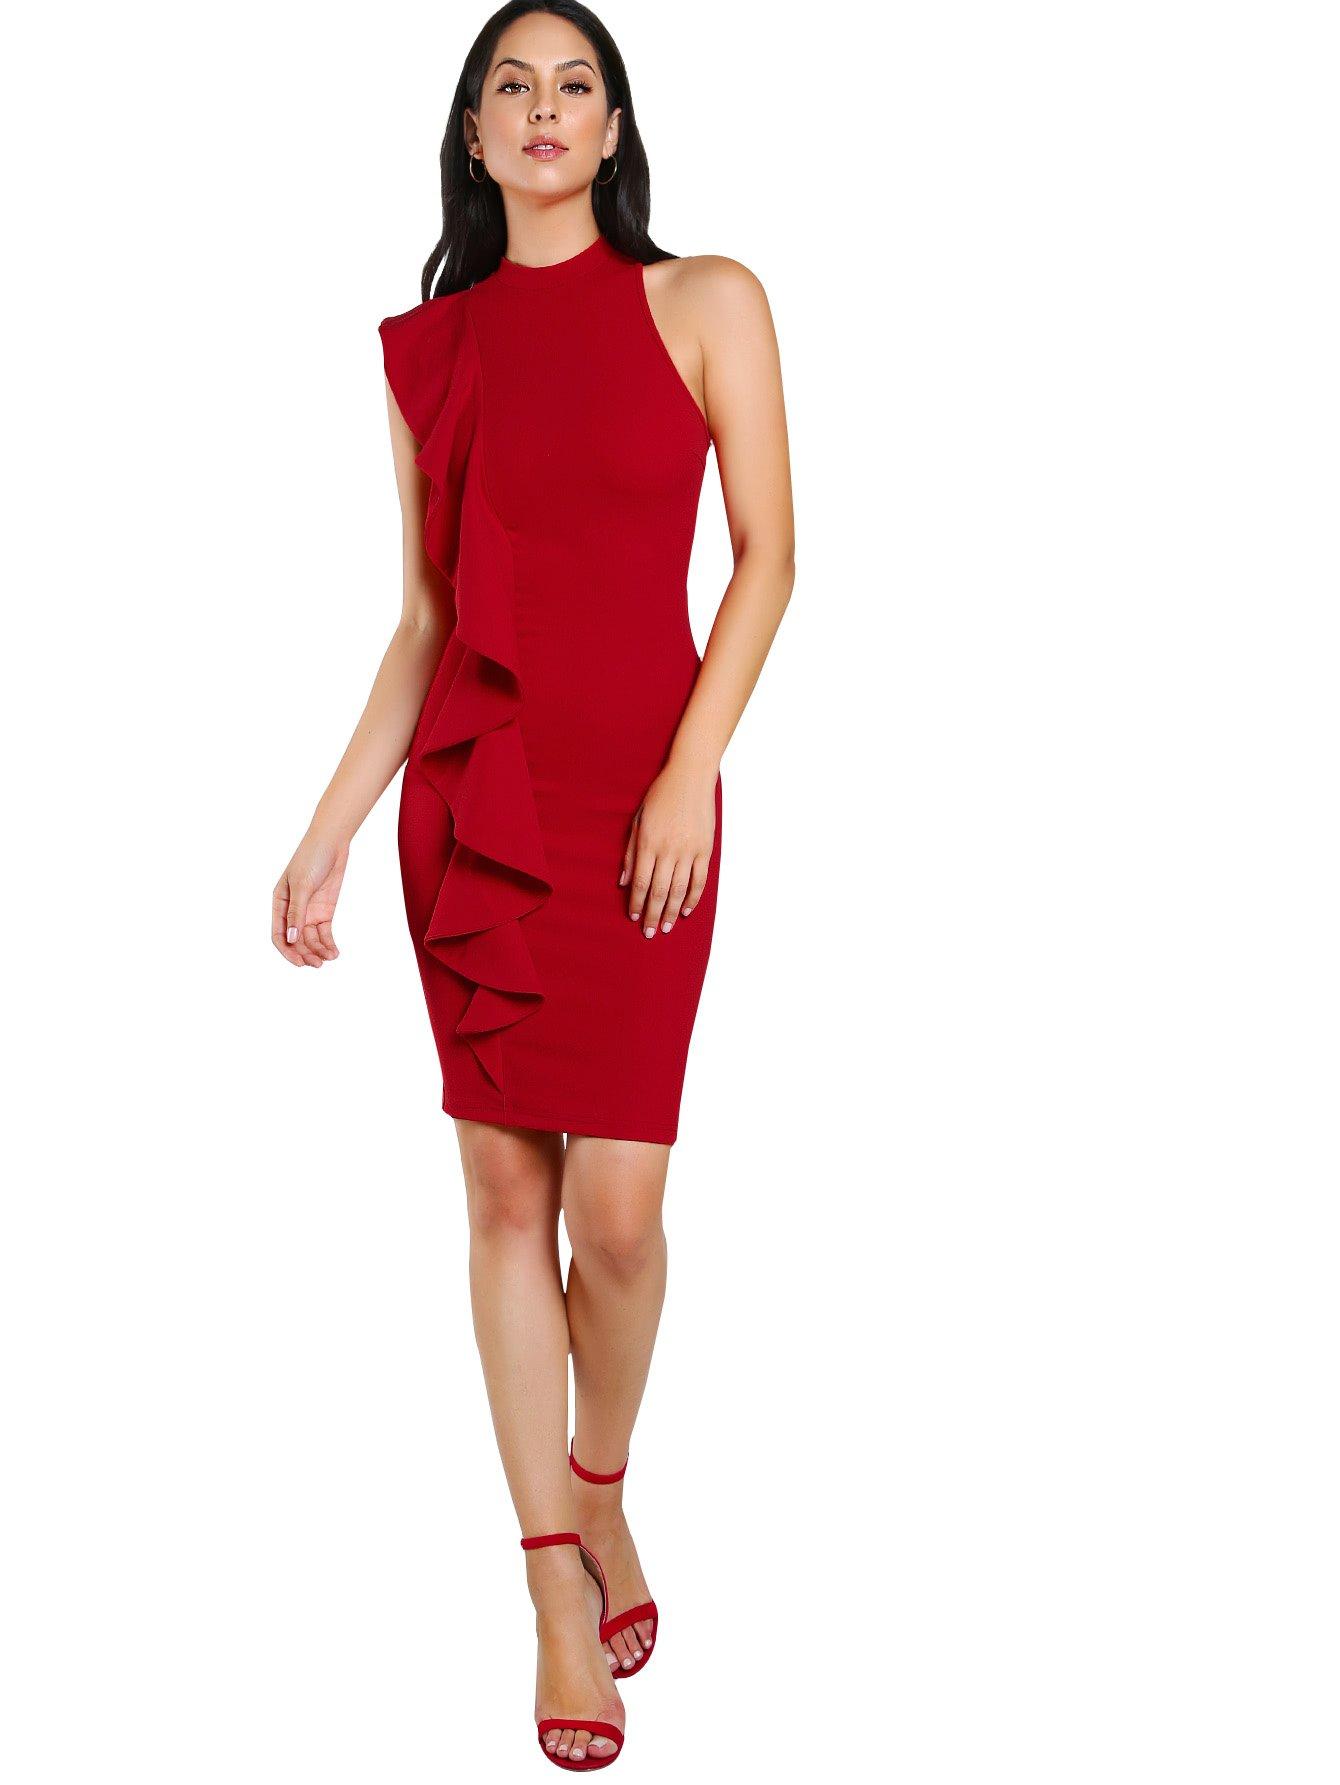 674863e5e52 Floerns Women s One Shoulder Side Sleeveless Ruffle Bodycon Dress Red L